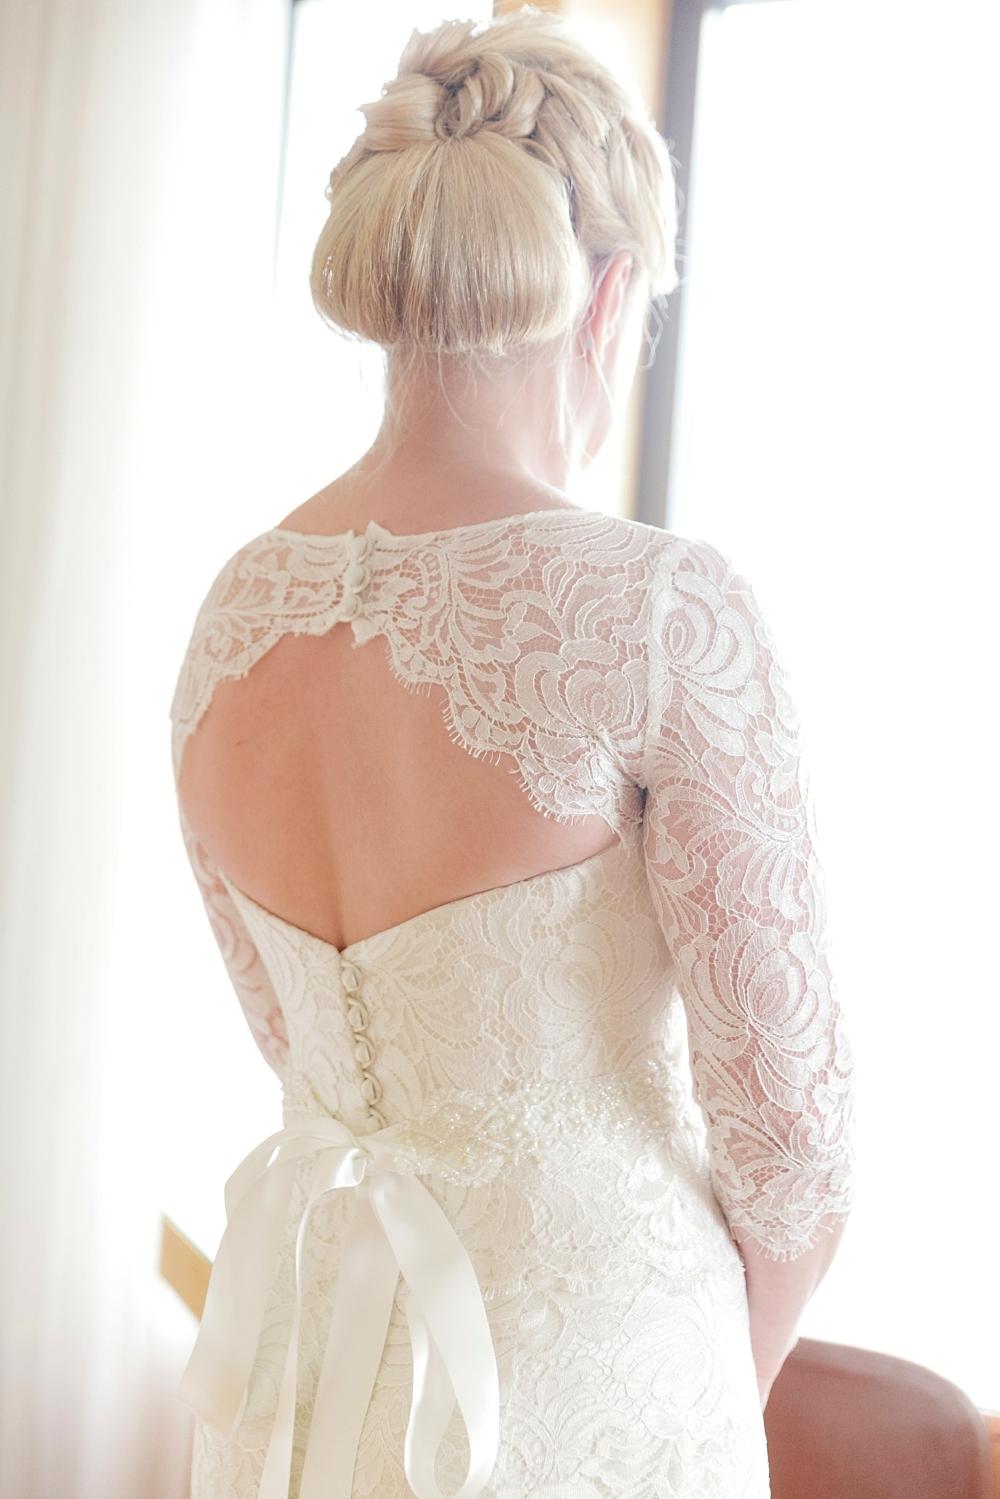 SB_topoftherock_nyc_wedding-138